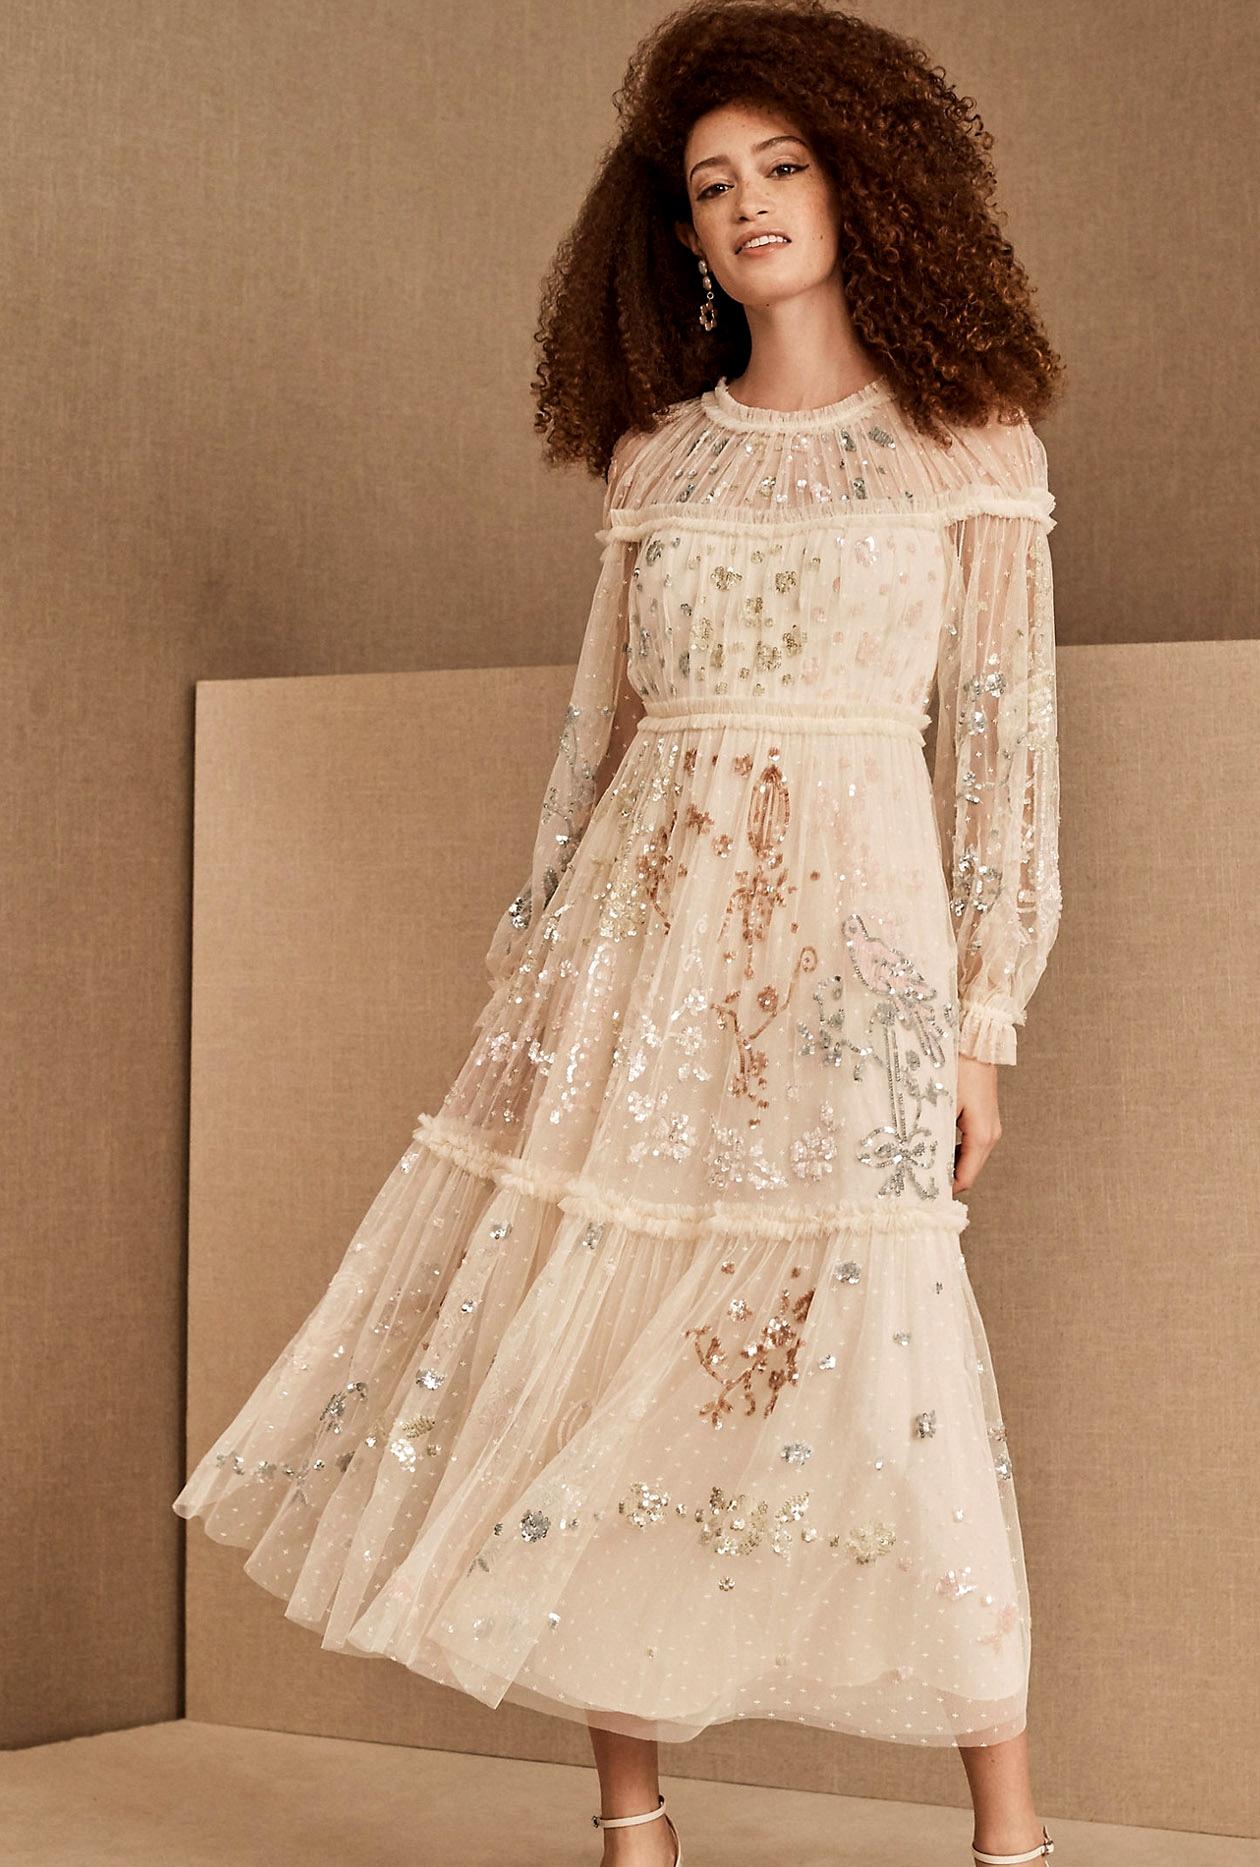 Needle & Thread Delphine Sequin Ballerina Dress